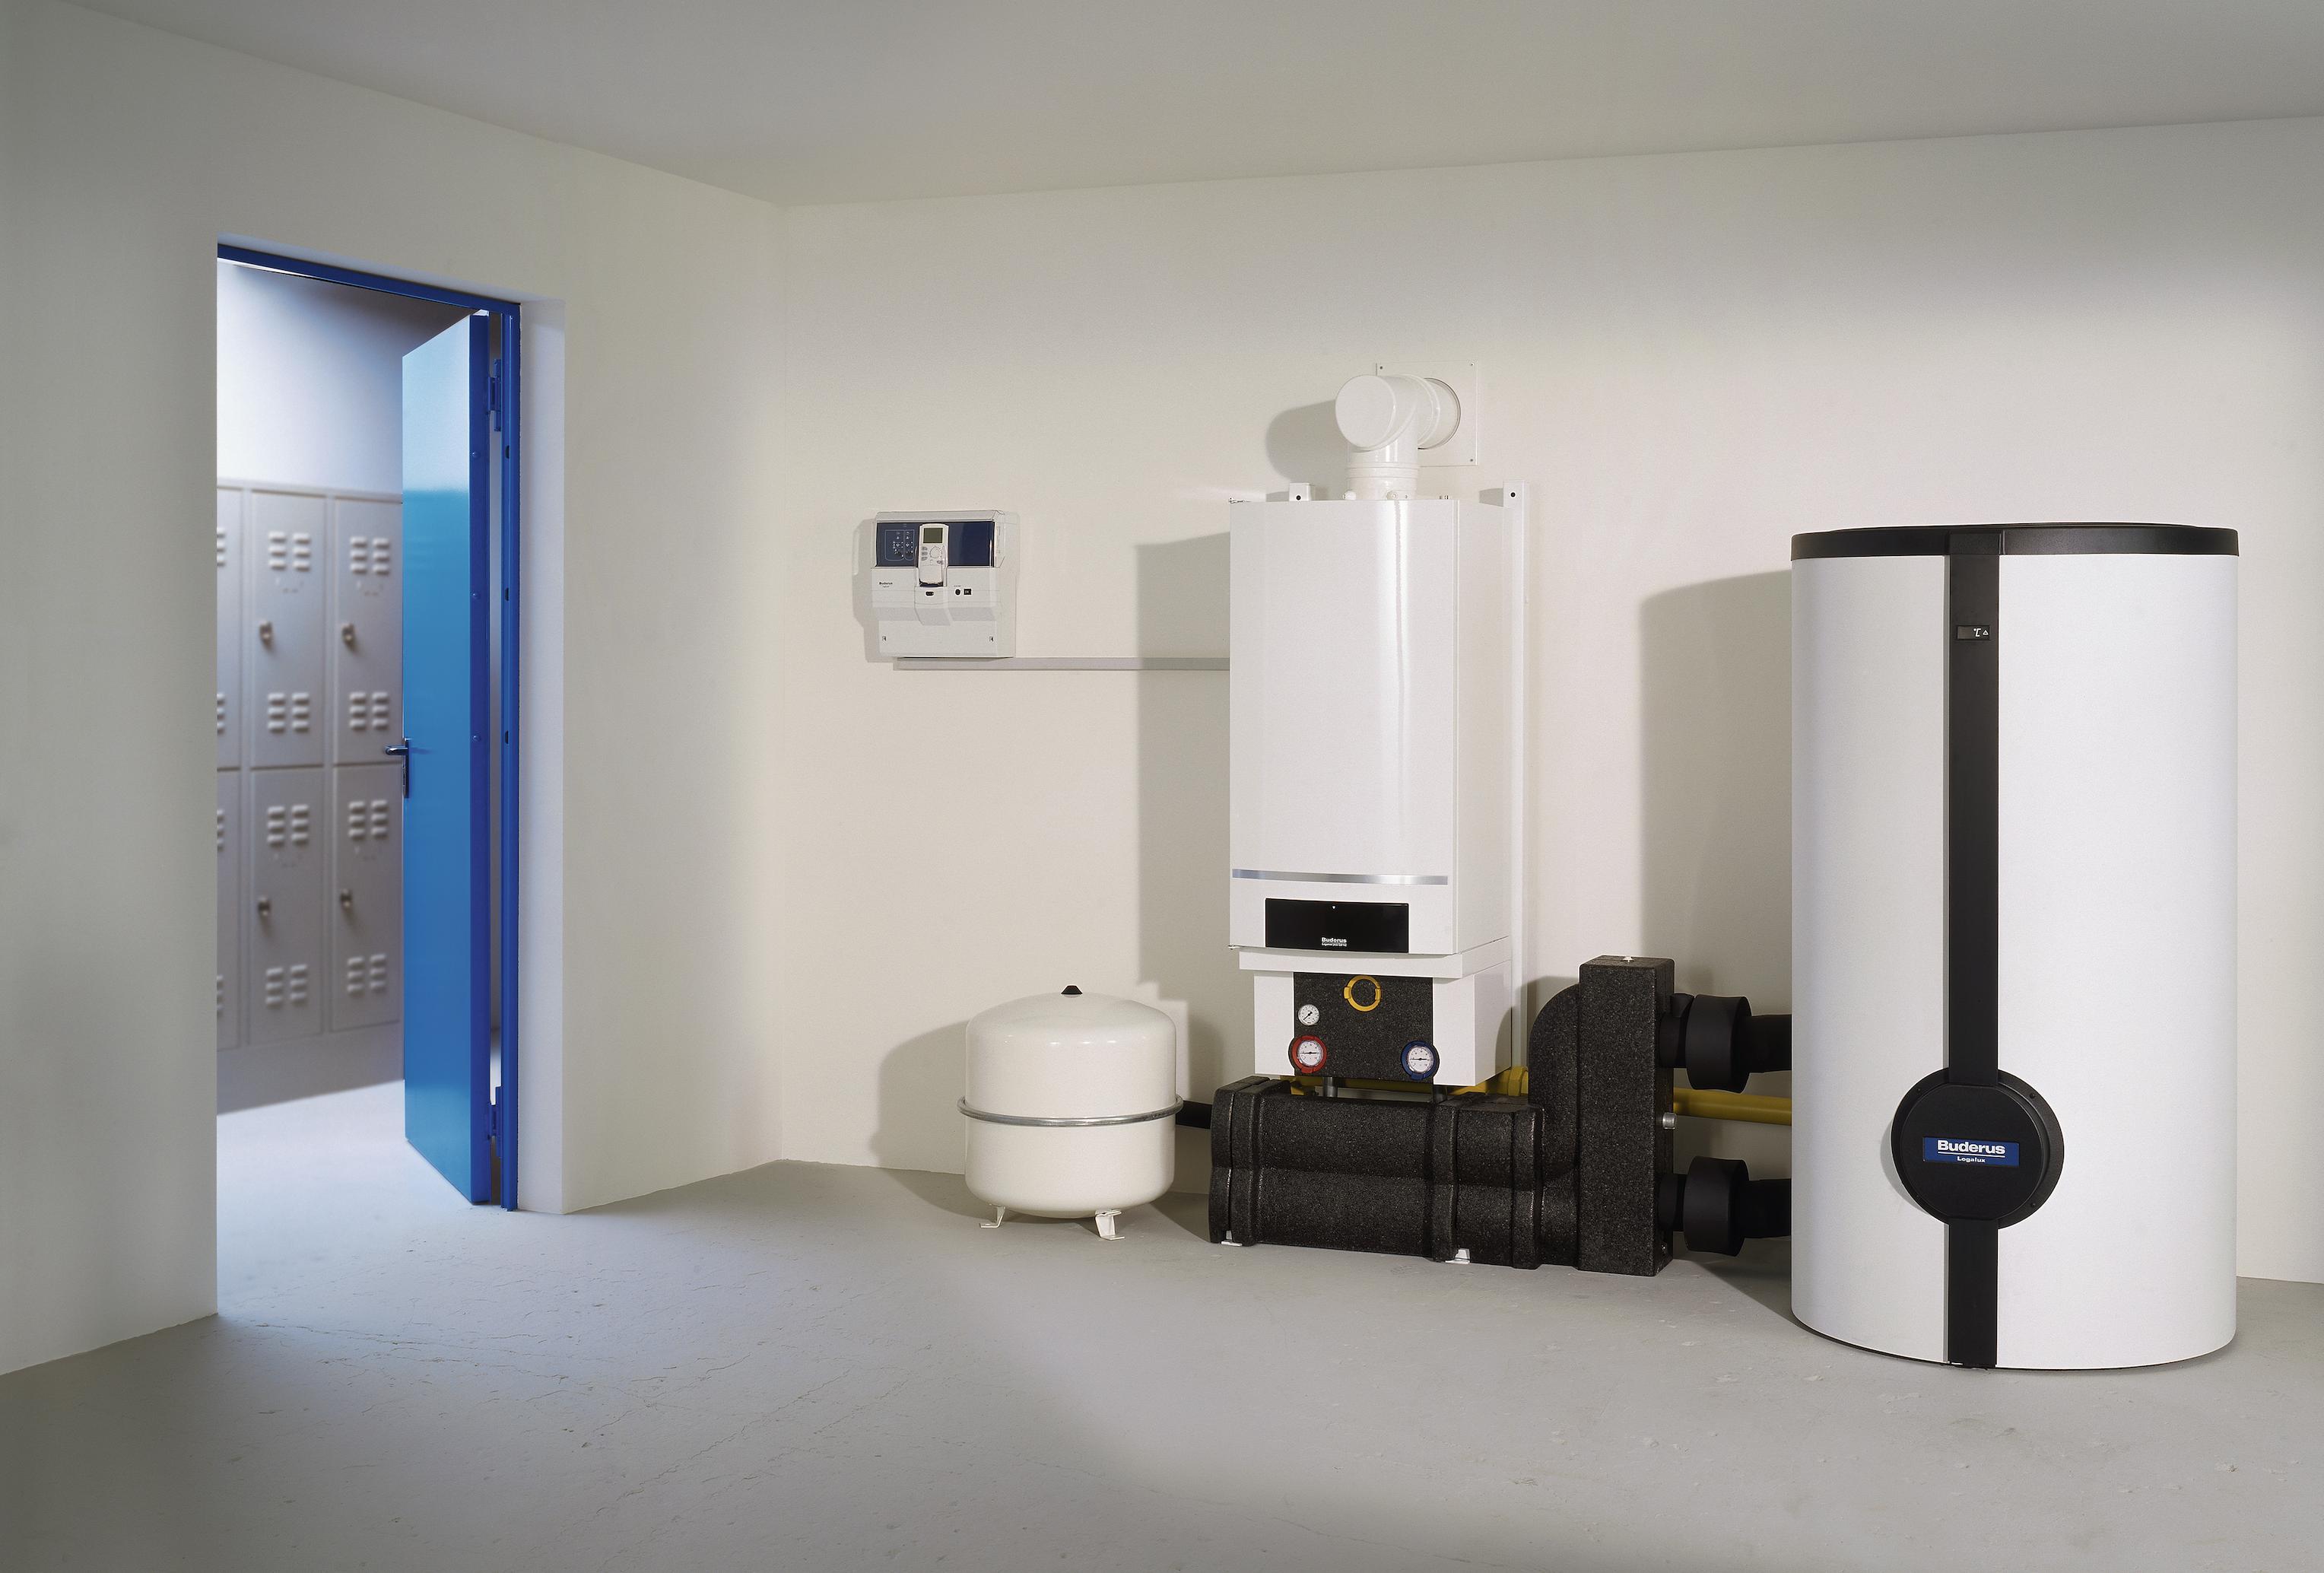 Quelle: Bosch Thermotechnik GmbH, Bu